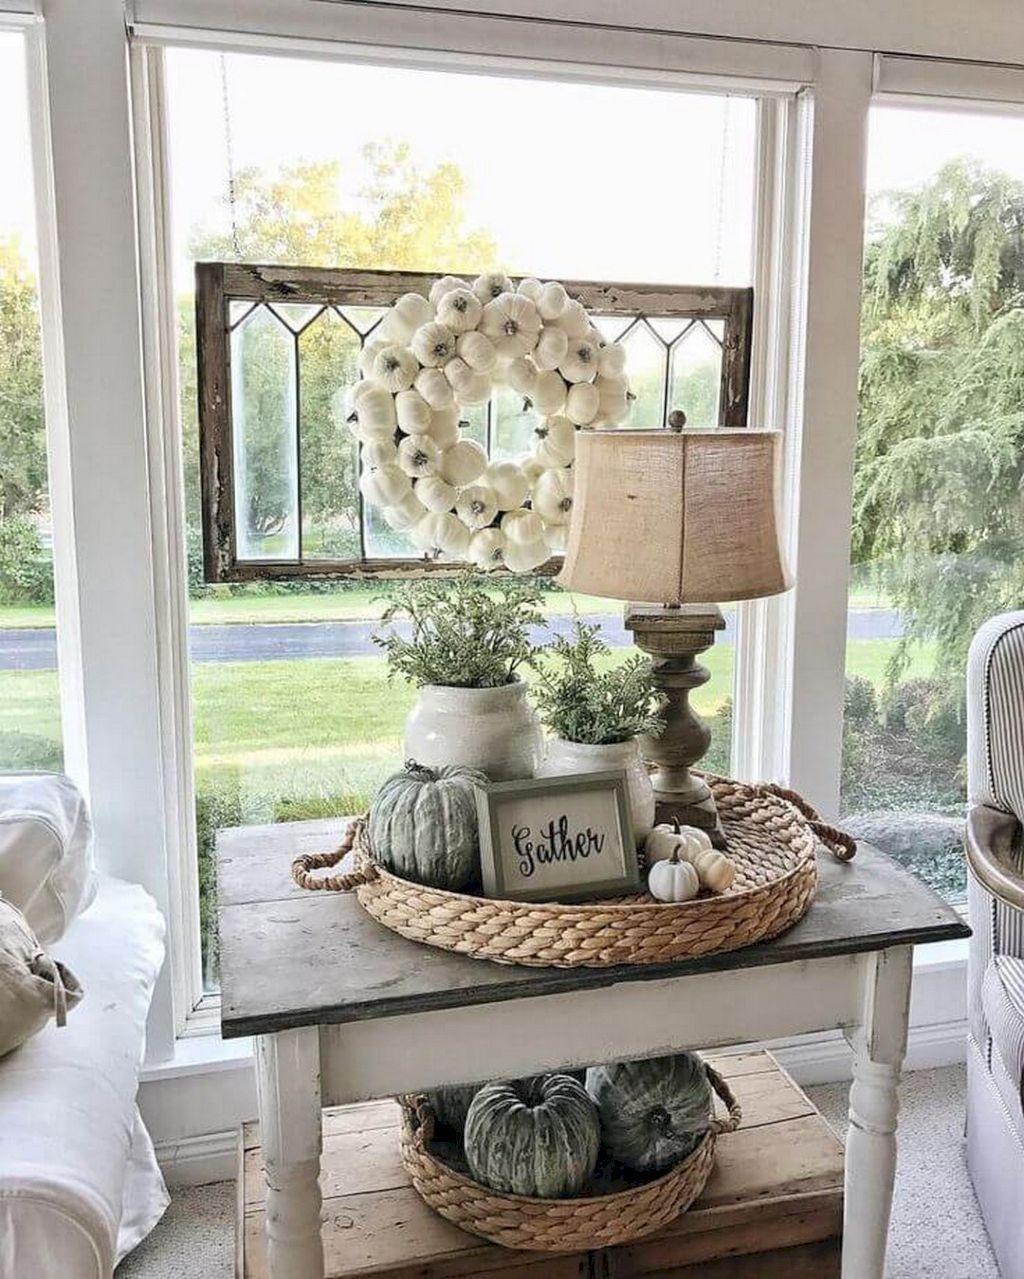 Cute Idea Using A Wicker Basket Tray For Decoration